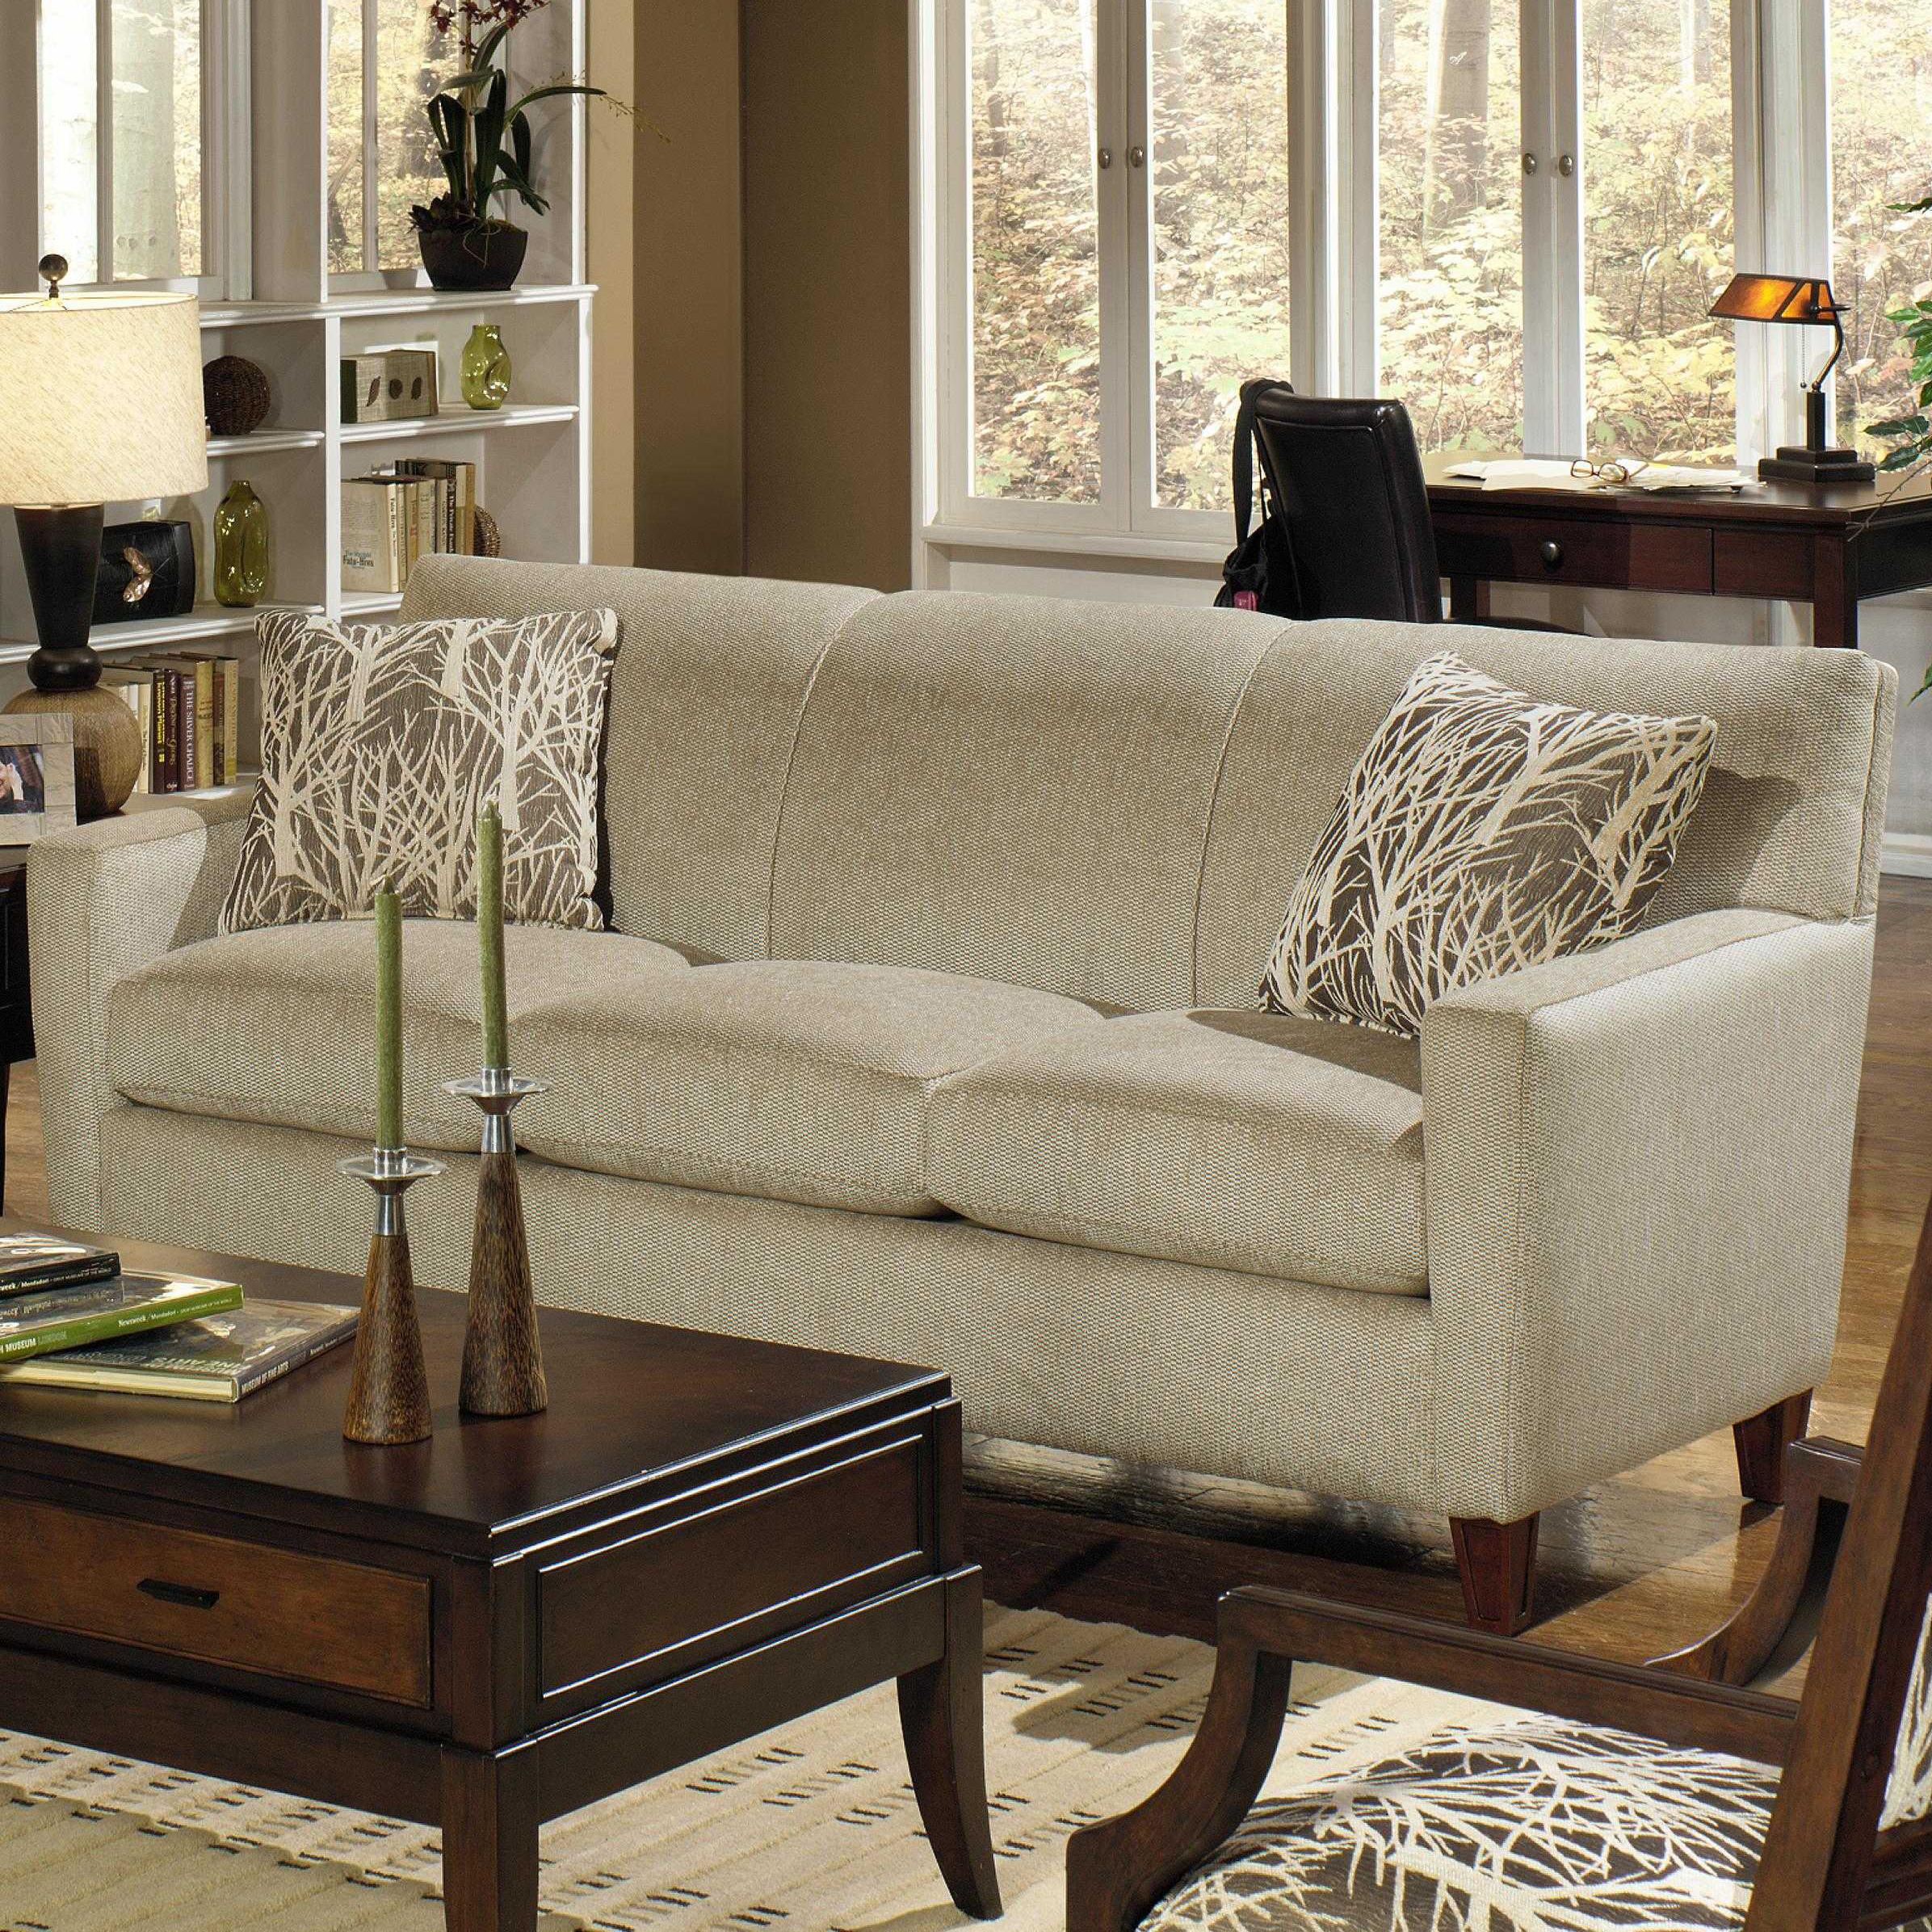 Craftmaster 7864 Contemporary Sofa Fmg Local Home Furnishing Sofas